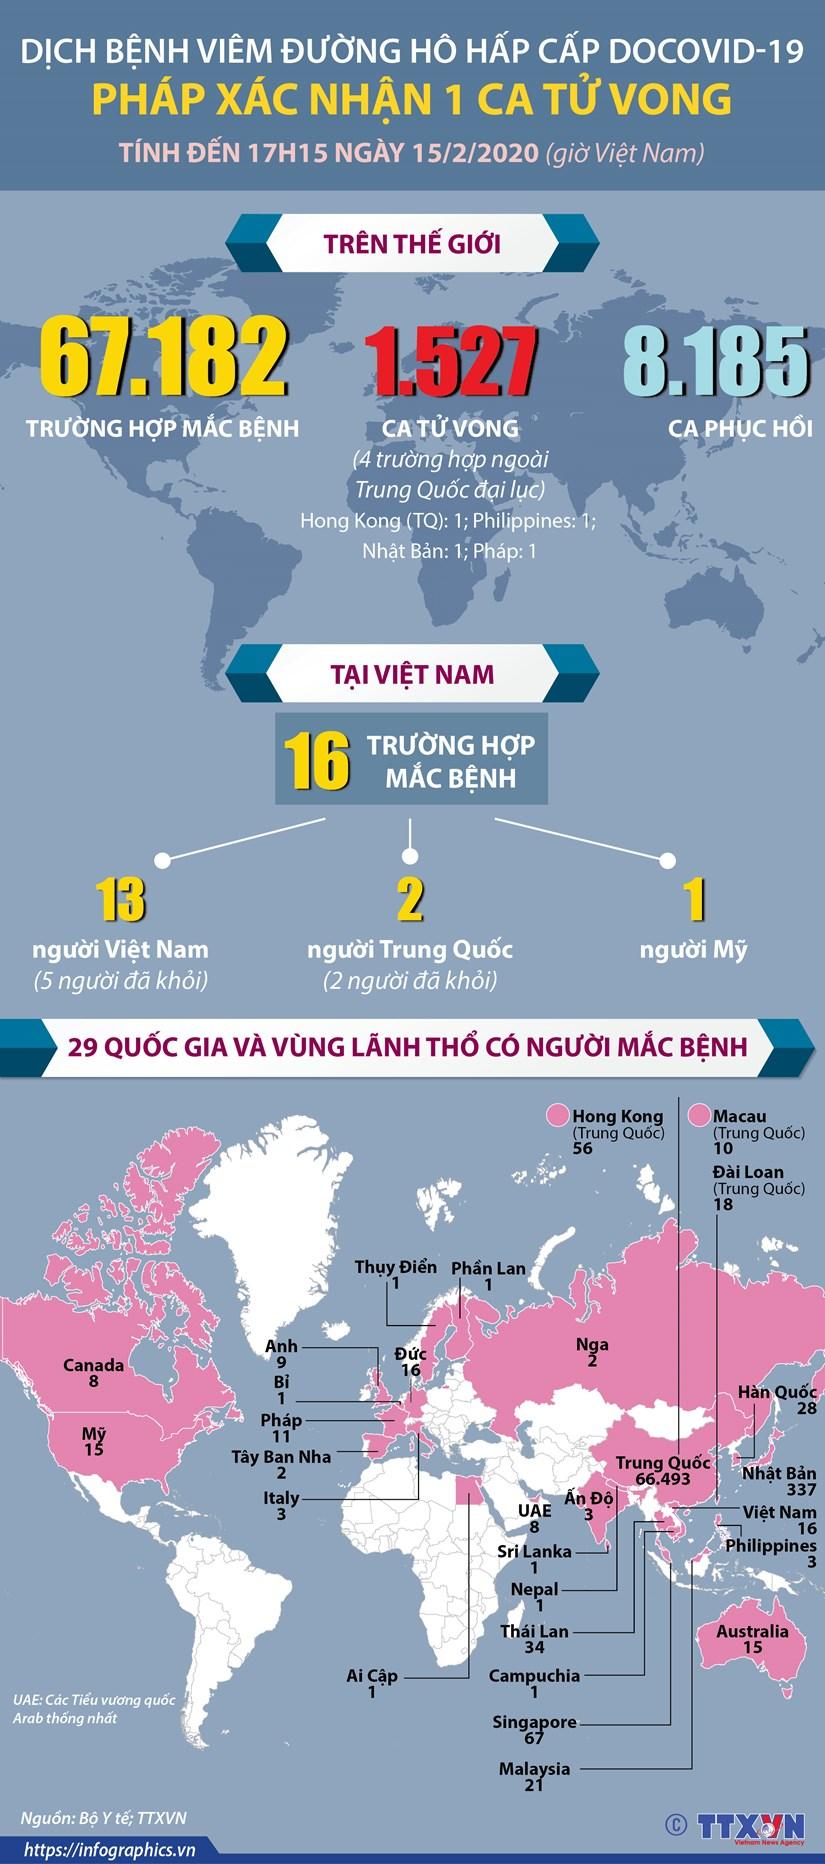 [Infographics] Phap xac nhan ca tu vong dau tien do COVID-19 hinh anh 1